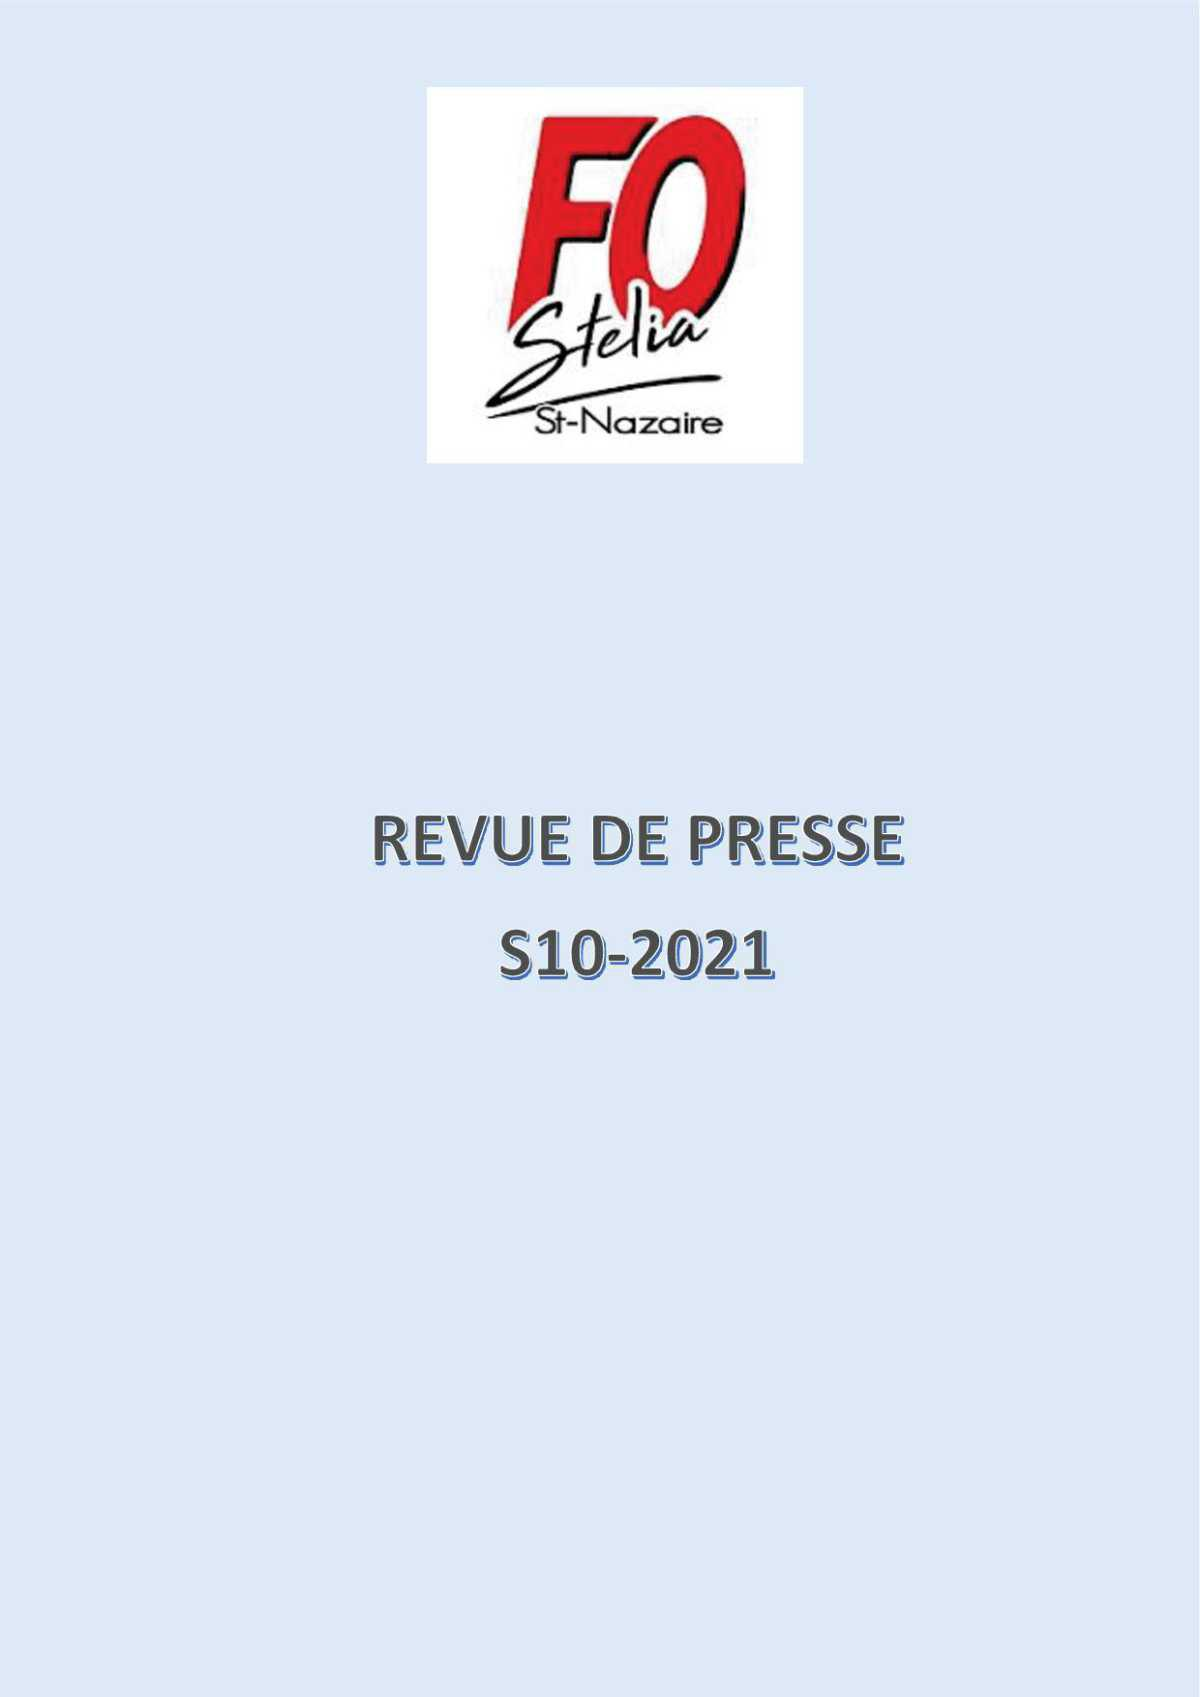 Revue de presse S10